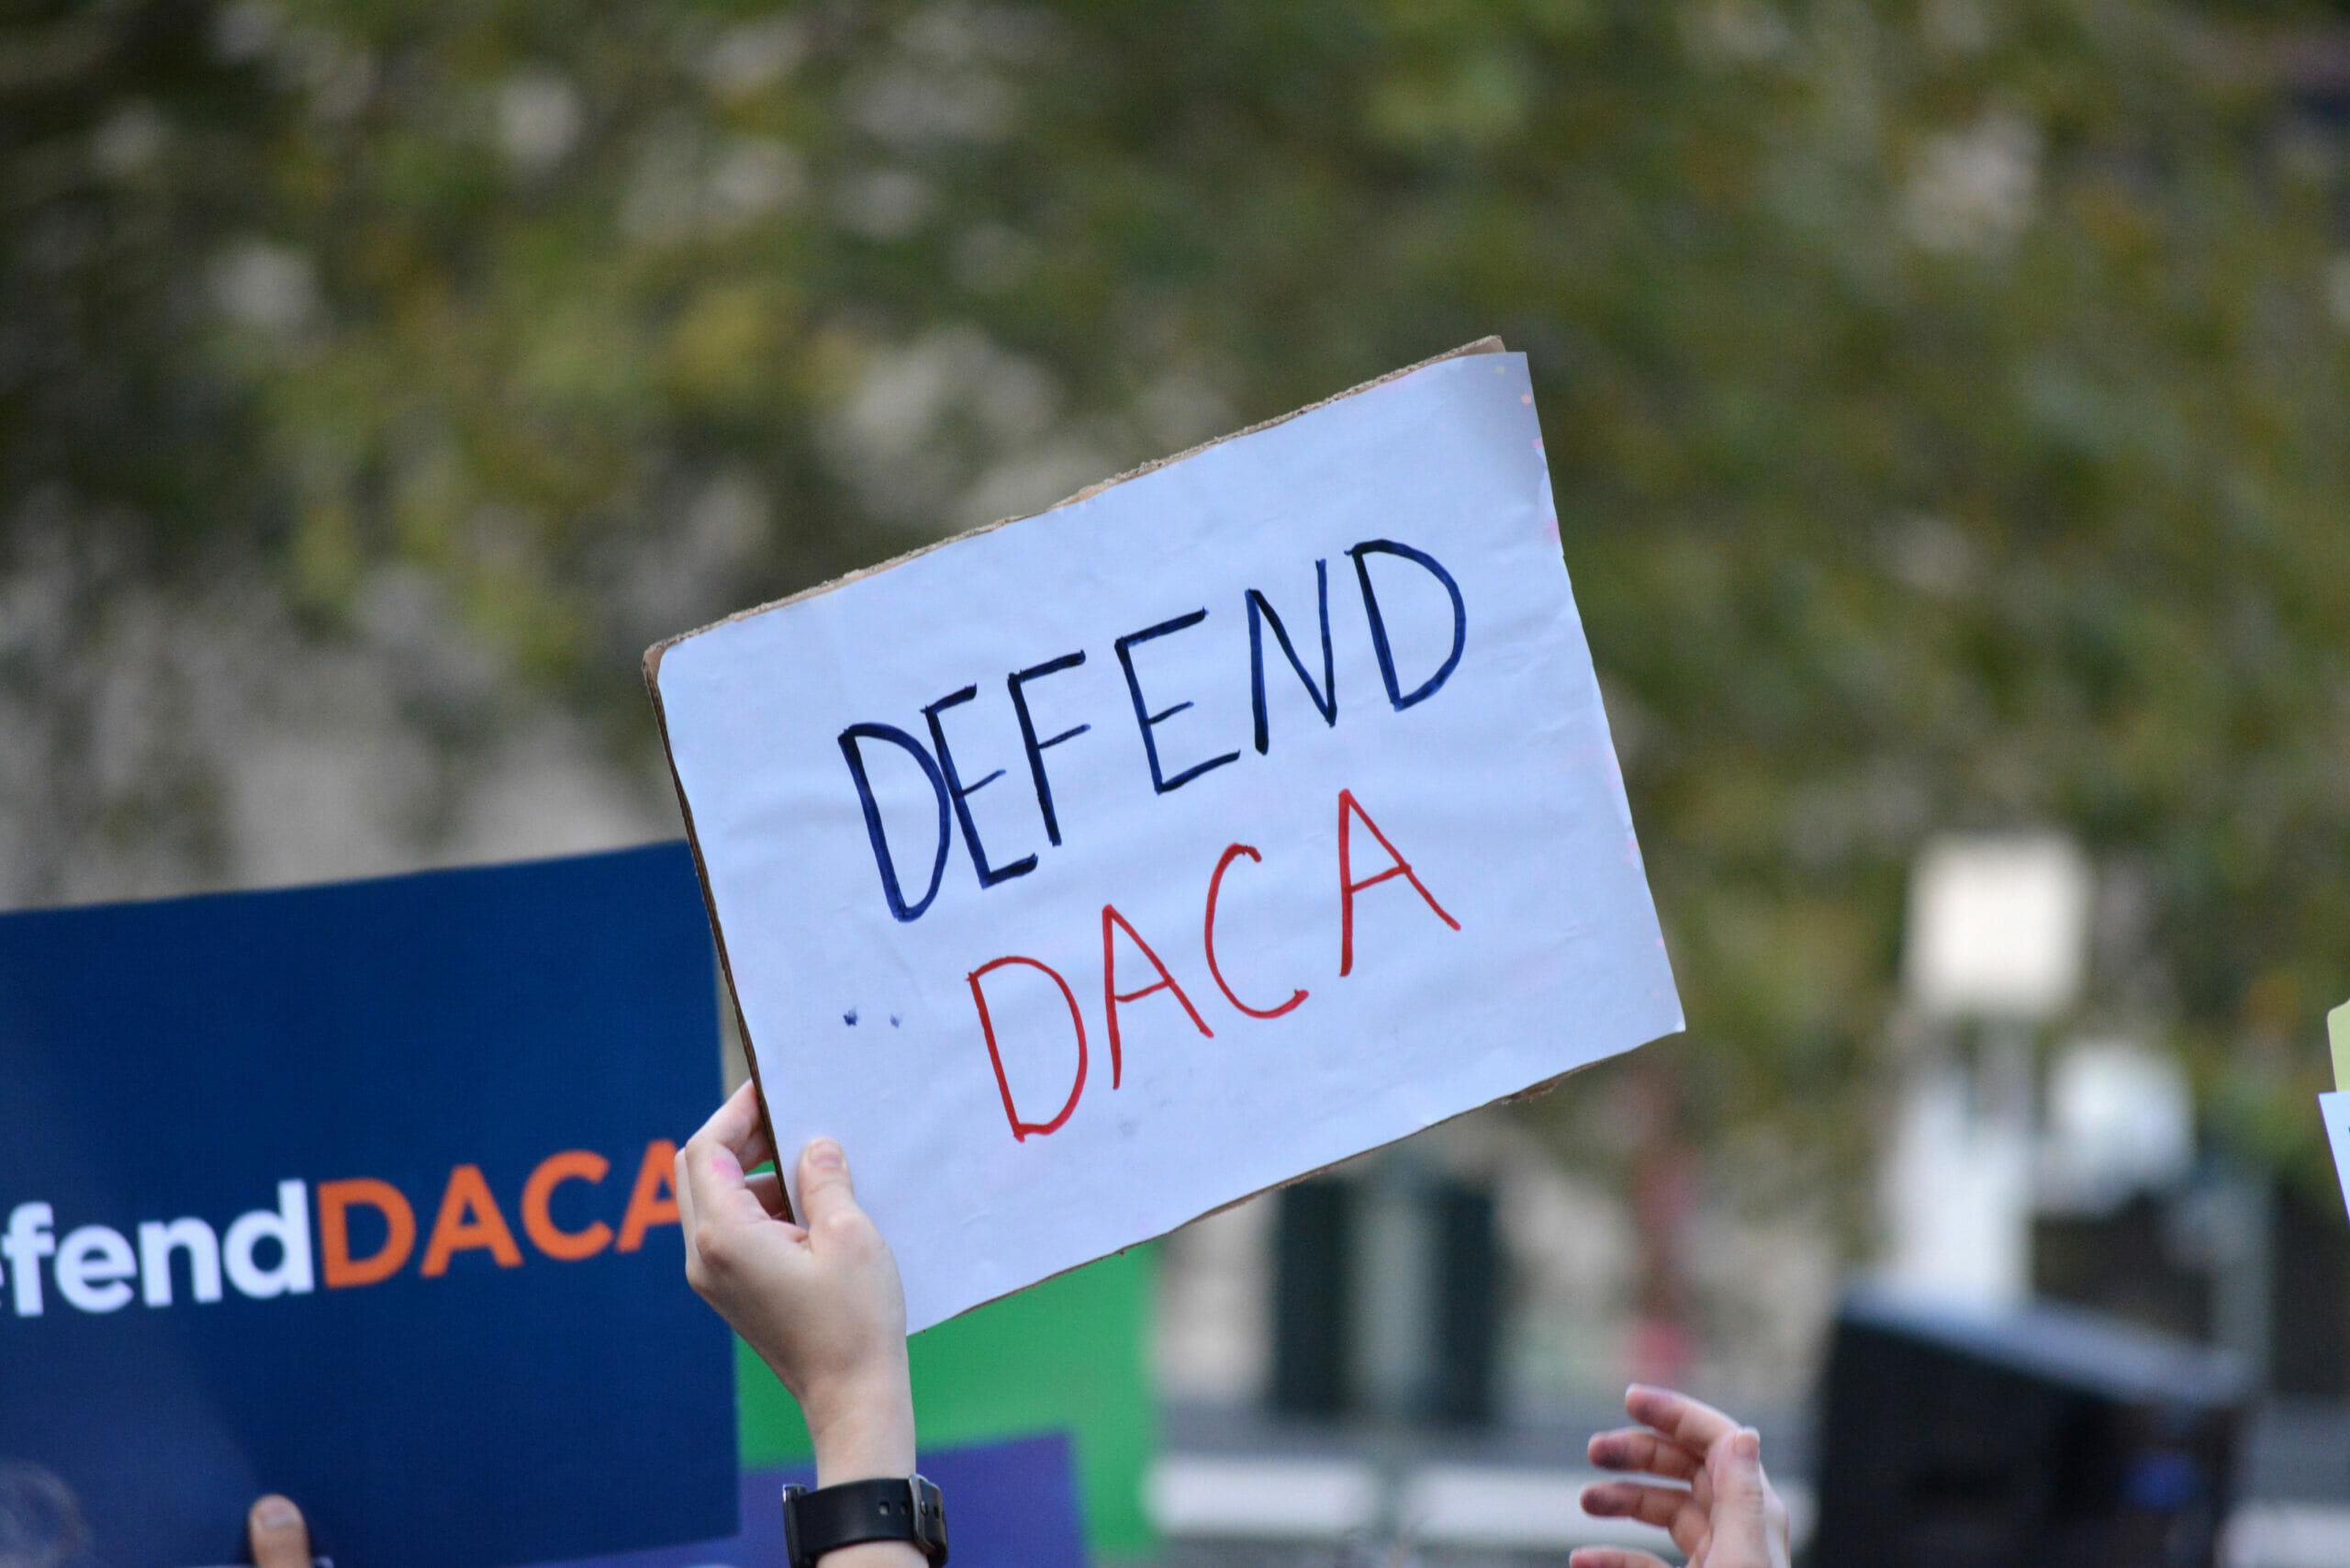 A DACA protest